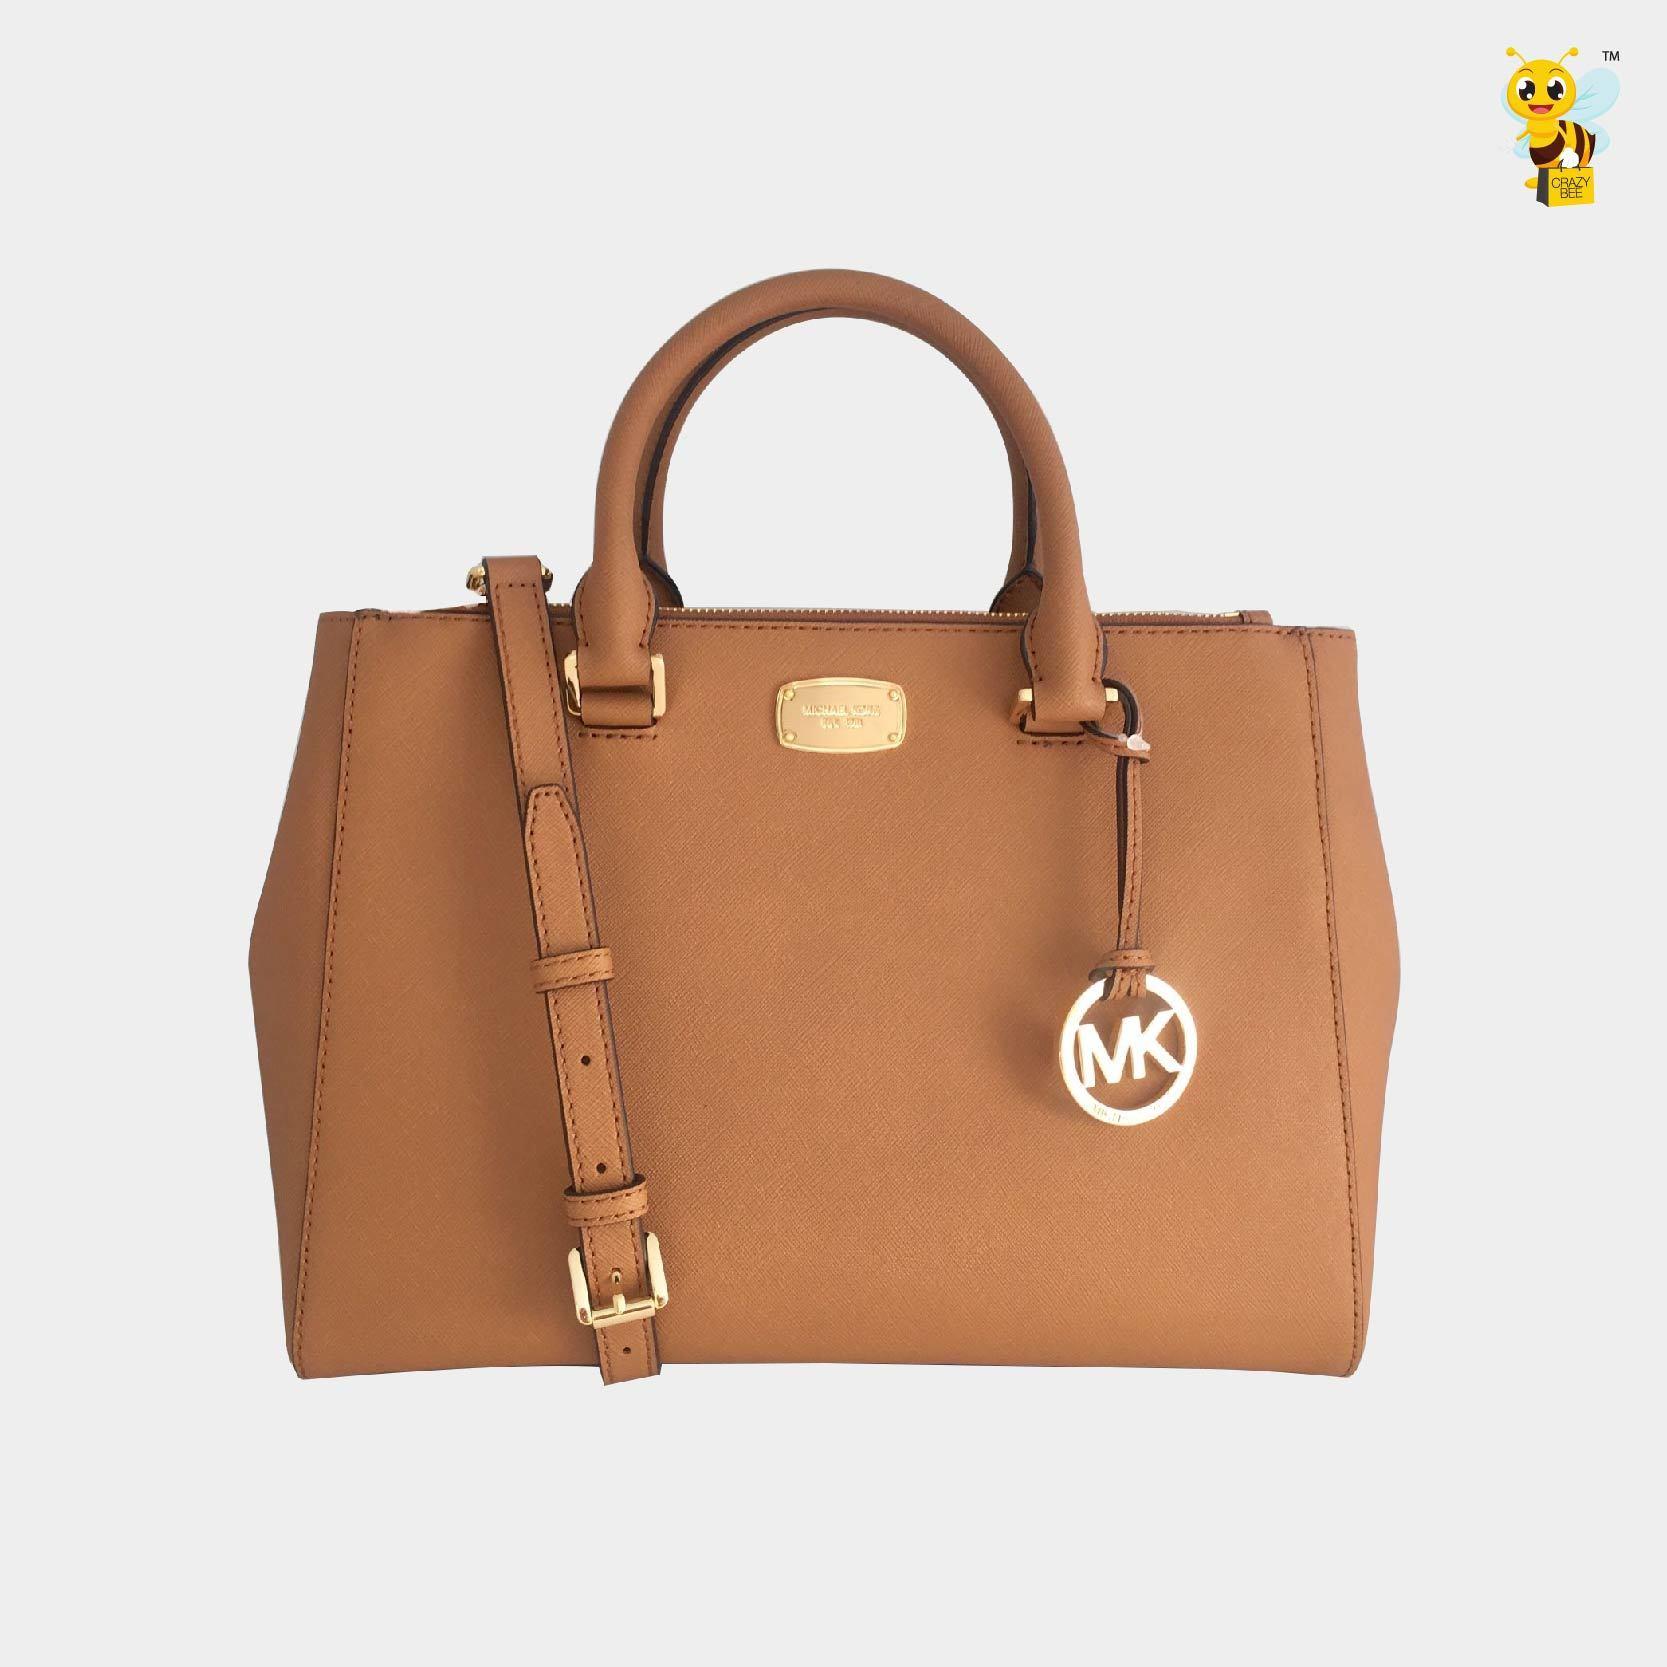 fef032b75ce8 MICHAEL KORS  PRE-ORDER  Kellen Medium Satchel Leather Handbag ...